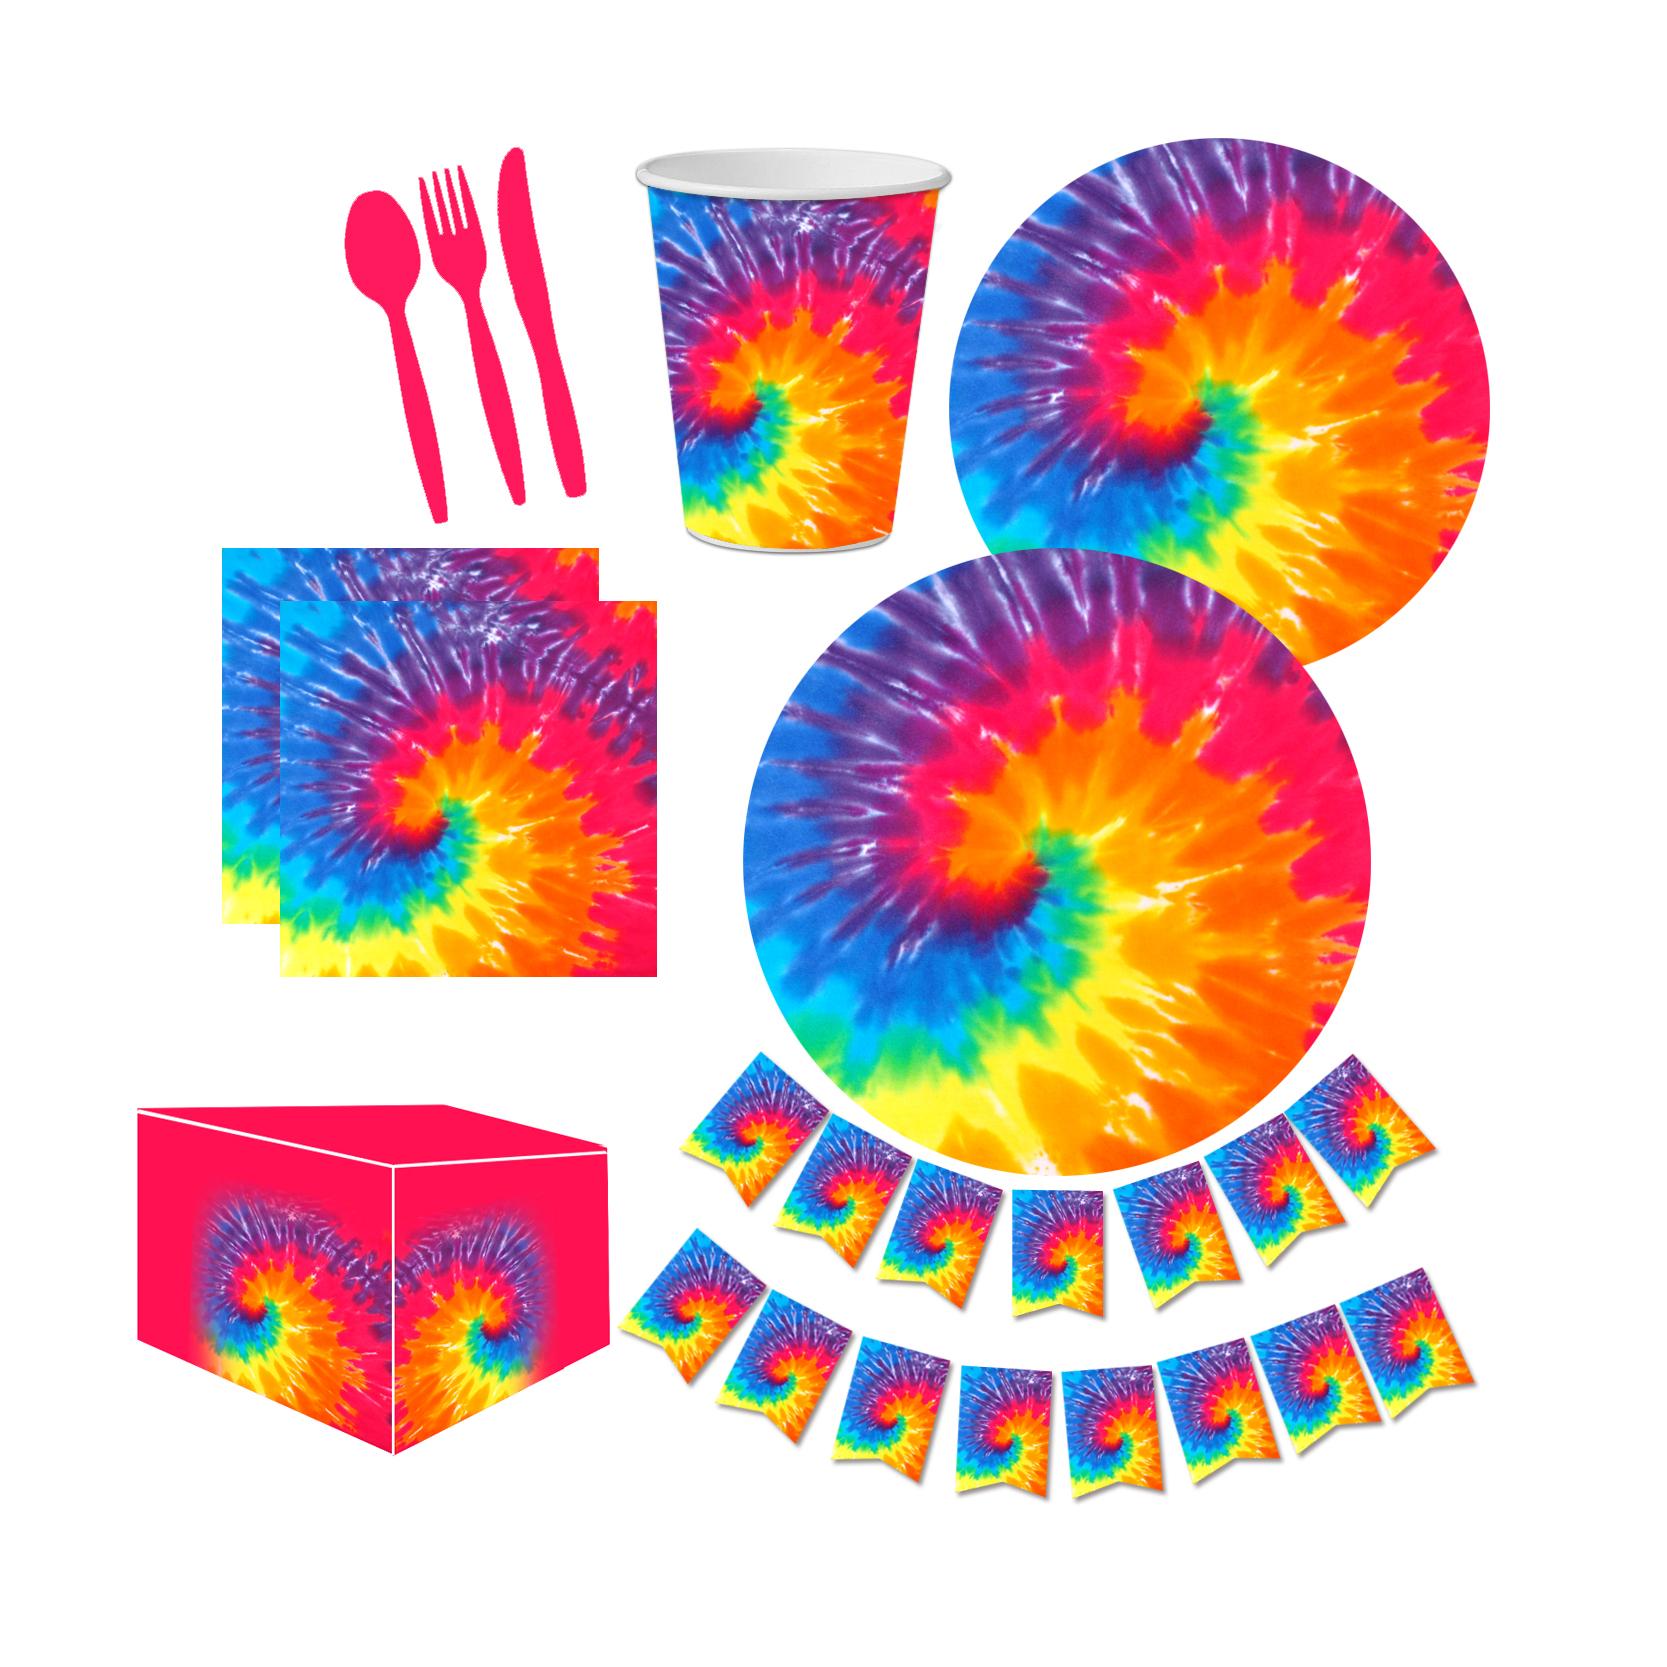 Happy Birthday Party Supplies Tie Dye Design Set Buy Tie Dye Birthday Party Supplies Tableware Set For 16 Tie Dye Theme Birthday Party Supplies Set Tie Dye Rainbow Paper Dessert Plates And Napkins